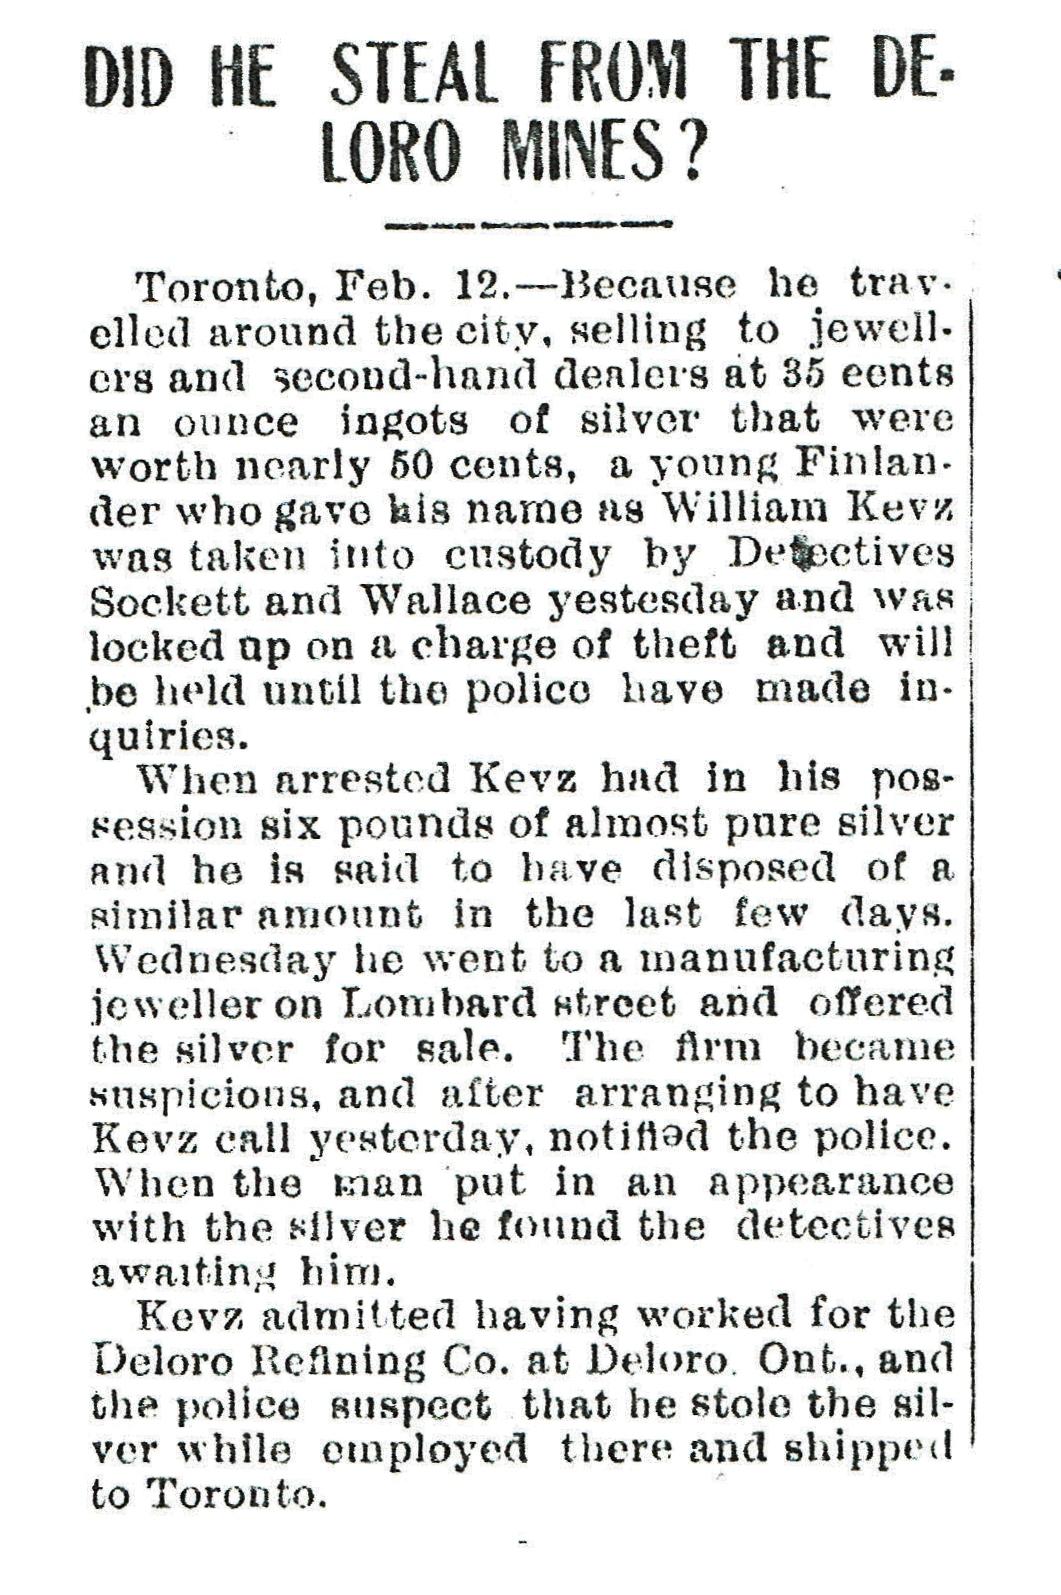 Kevz Deloro theft 1909.jpg